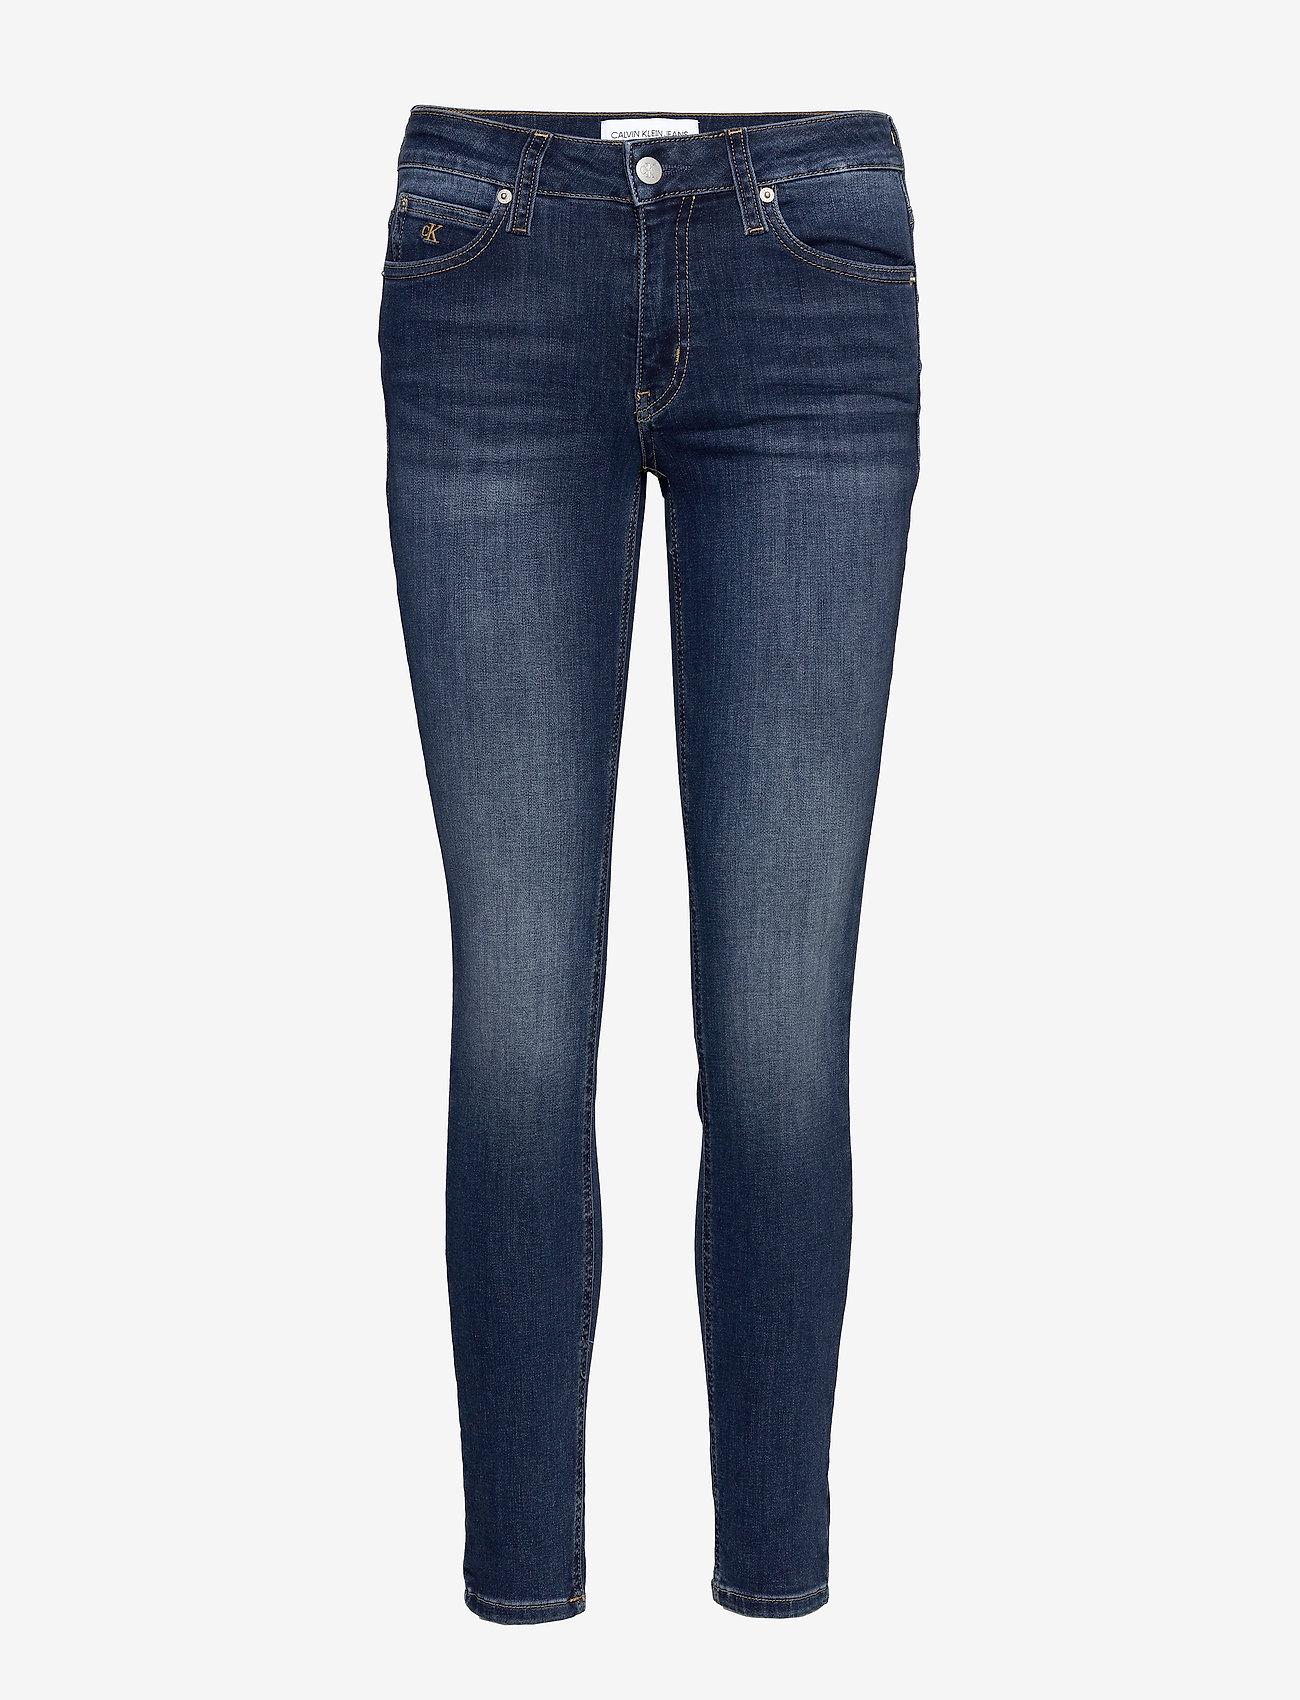 Calvin Klein Jeans - CKJ 011 MID RISE SKINNY - skinny jeans - zz001 mid blue - 0